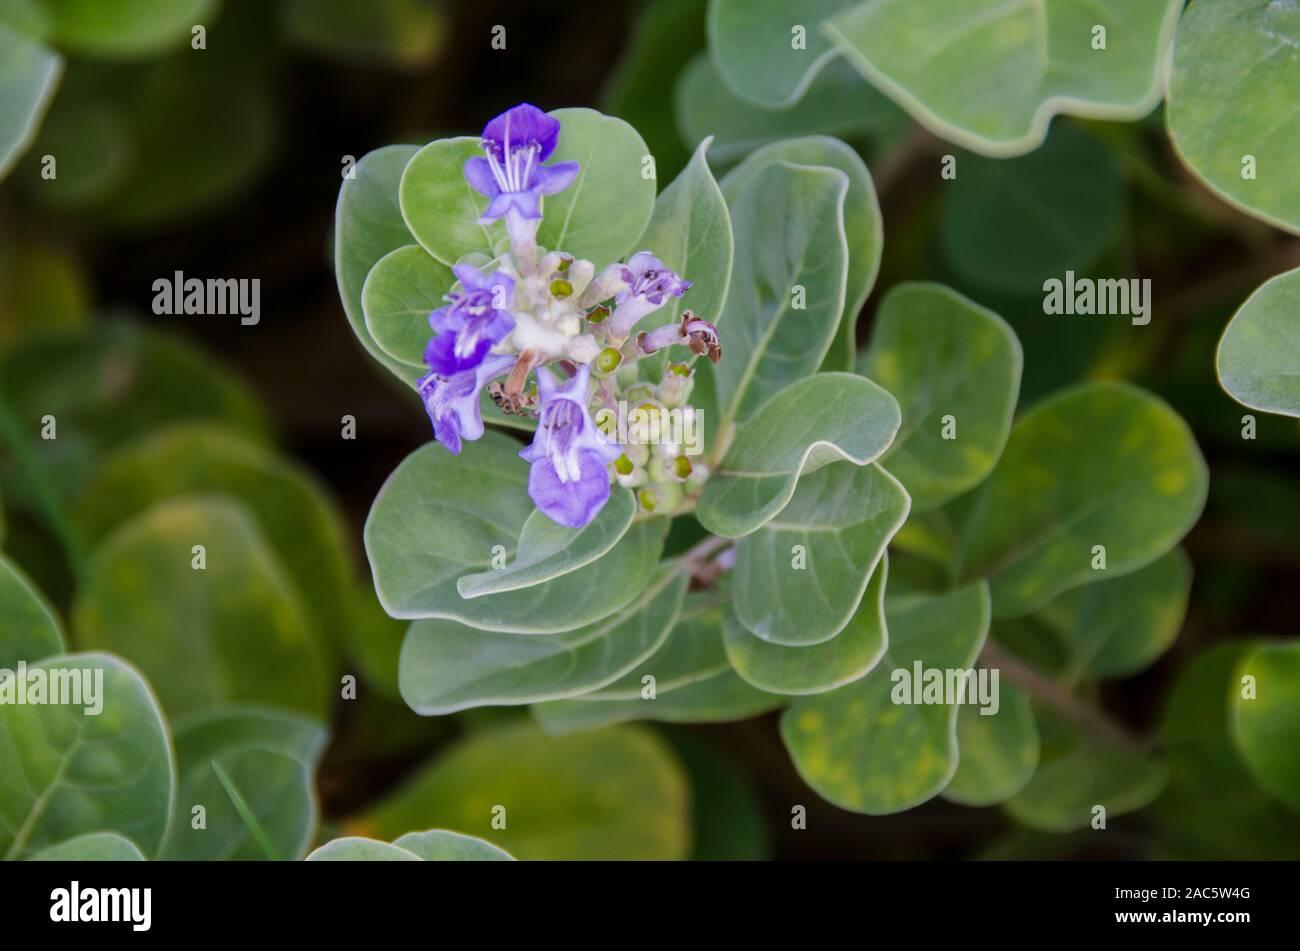 L'usine d'Hawaii a Pohinahina avec fleurs en forme de cloche, pétales bleu violet. Banque D'Images